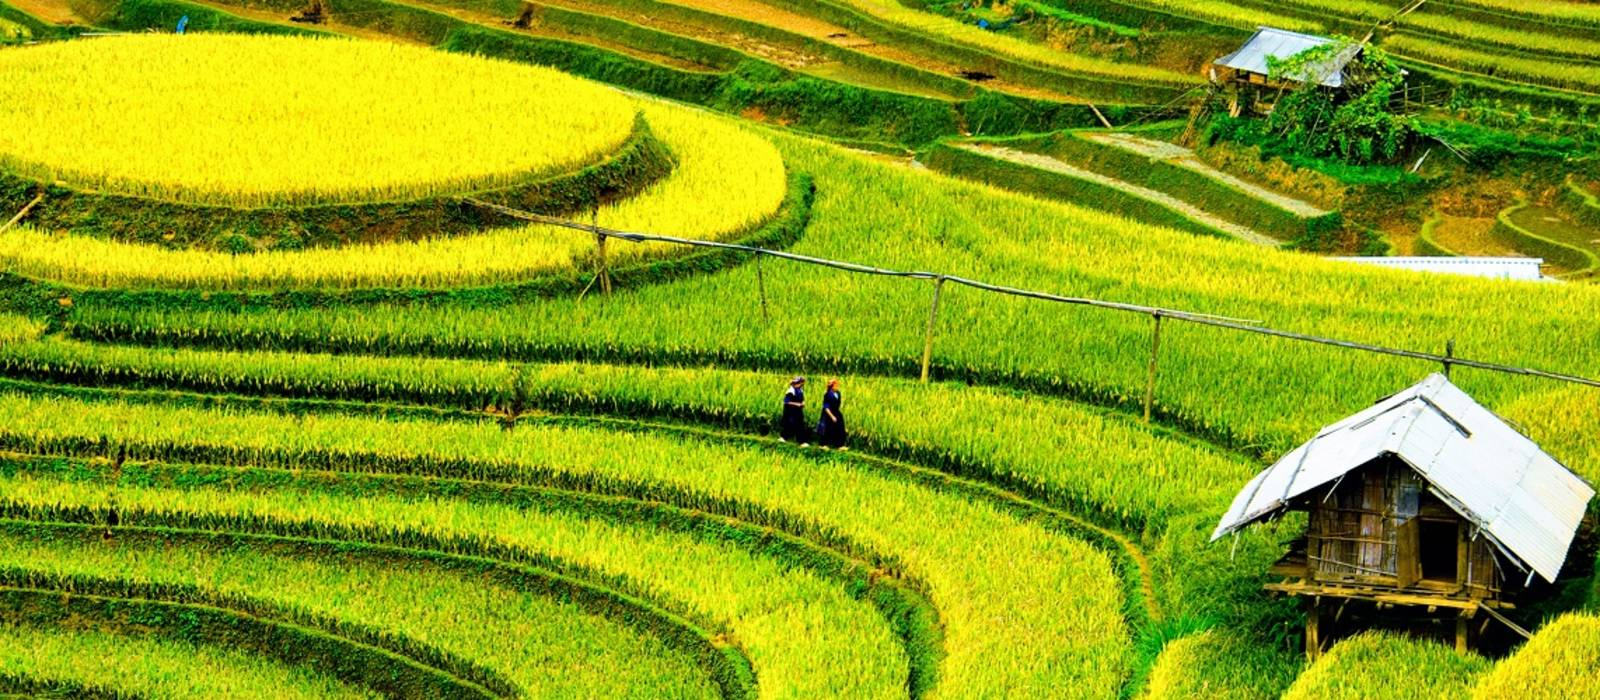 Best time to visit Vietnam - rice fields in Mai chau